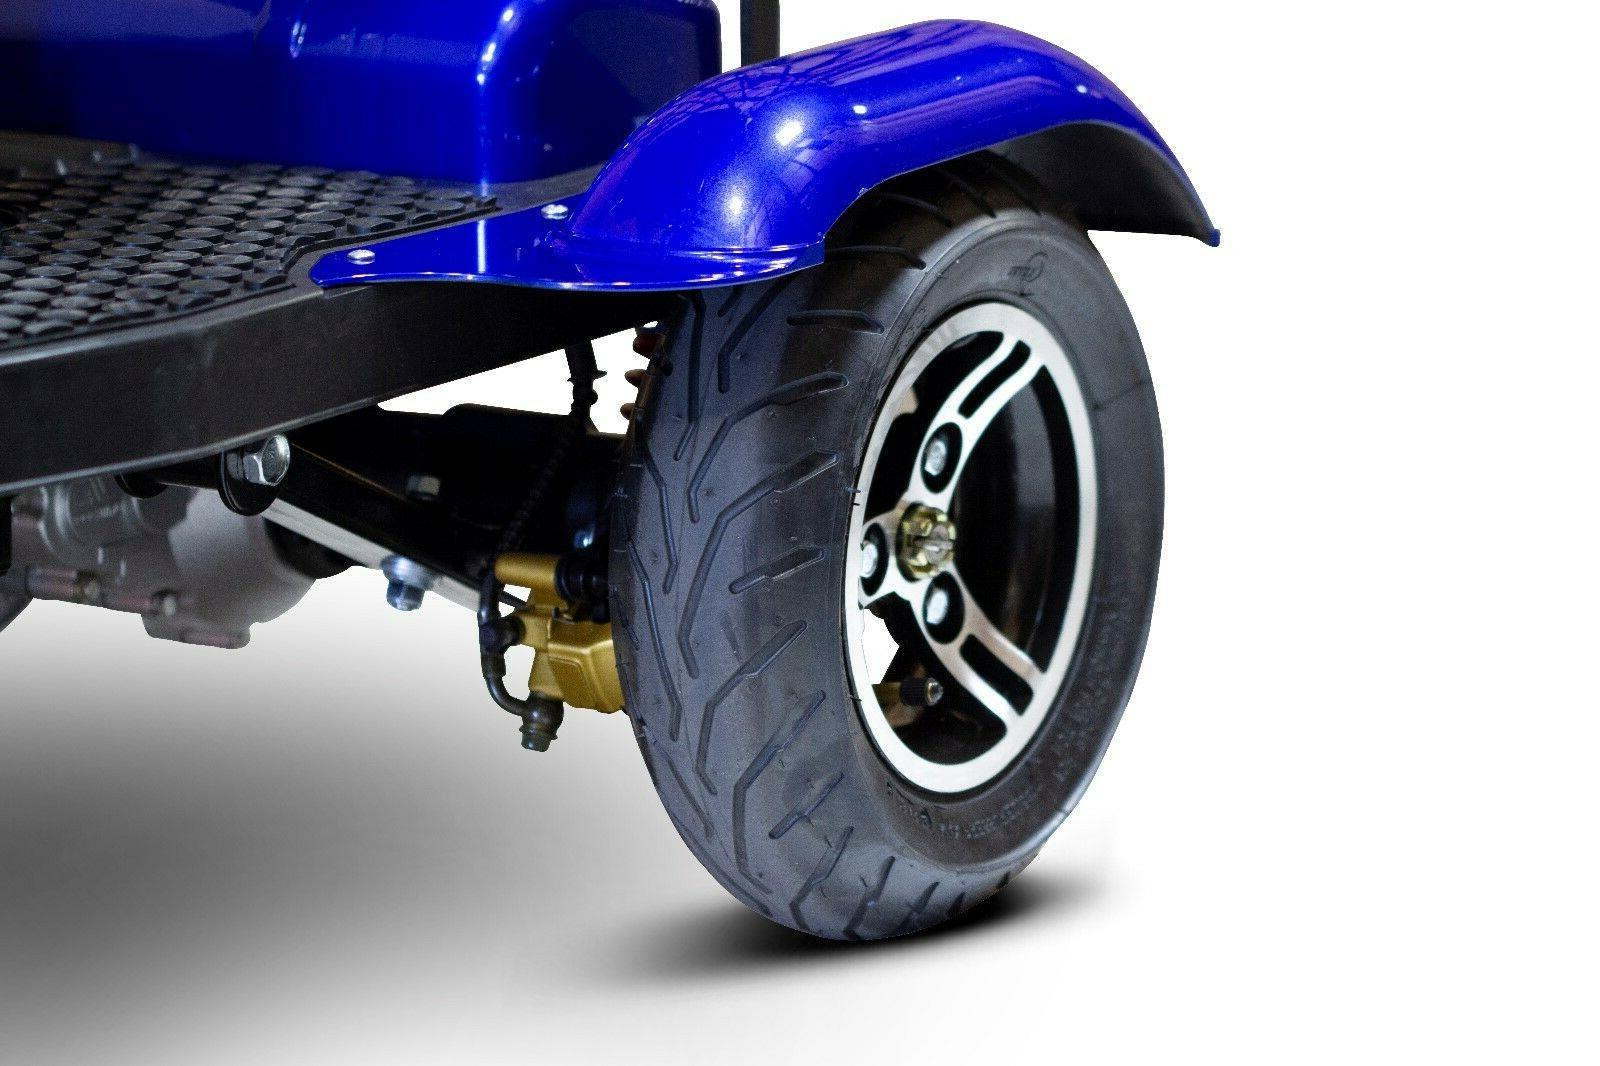 eWheels Blue Mobility Loaded, NO TAX